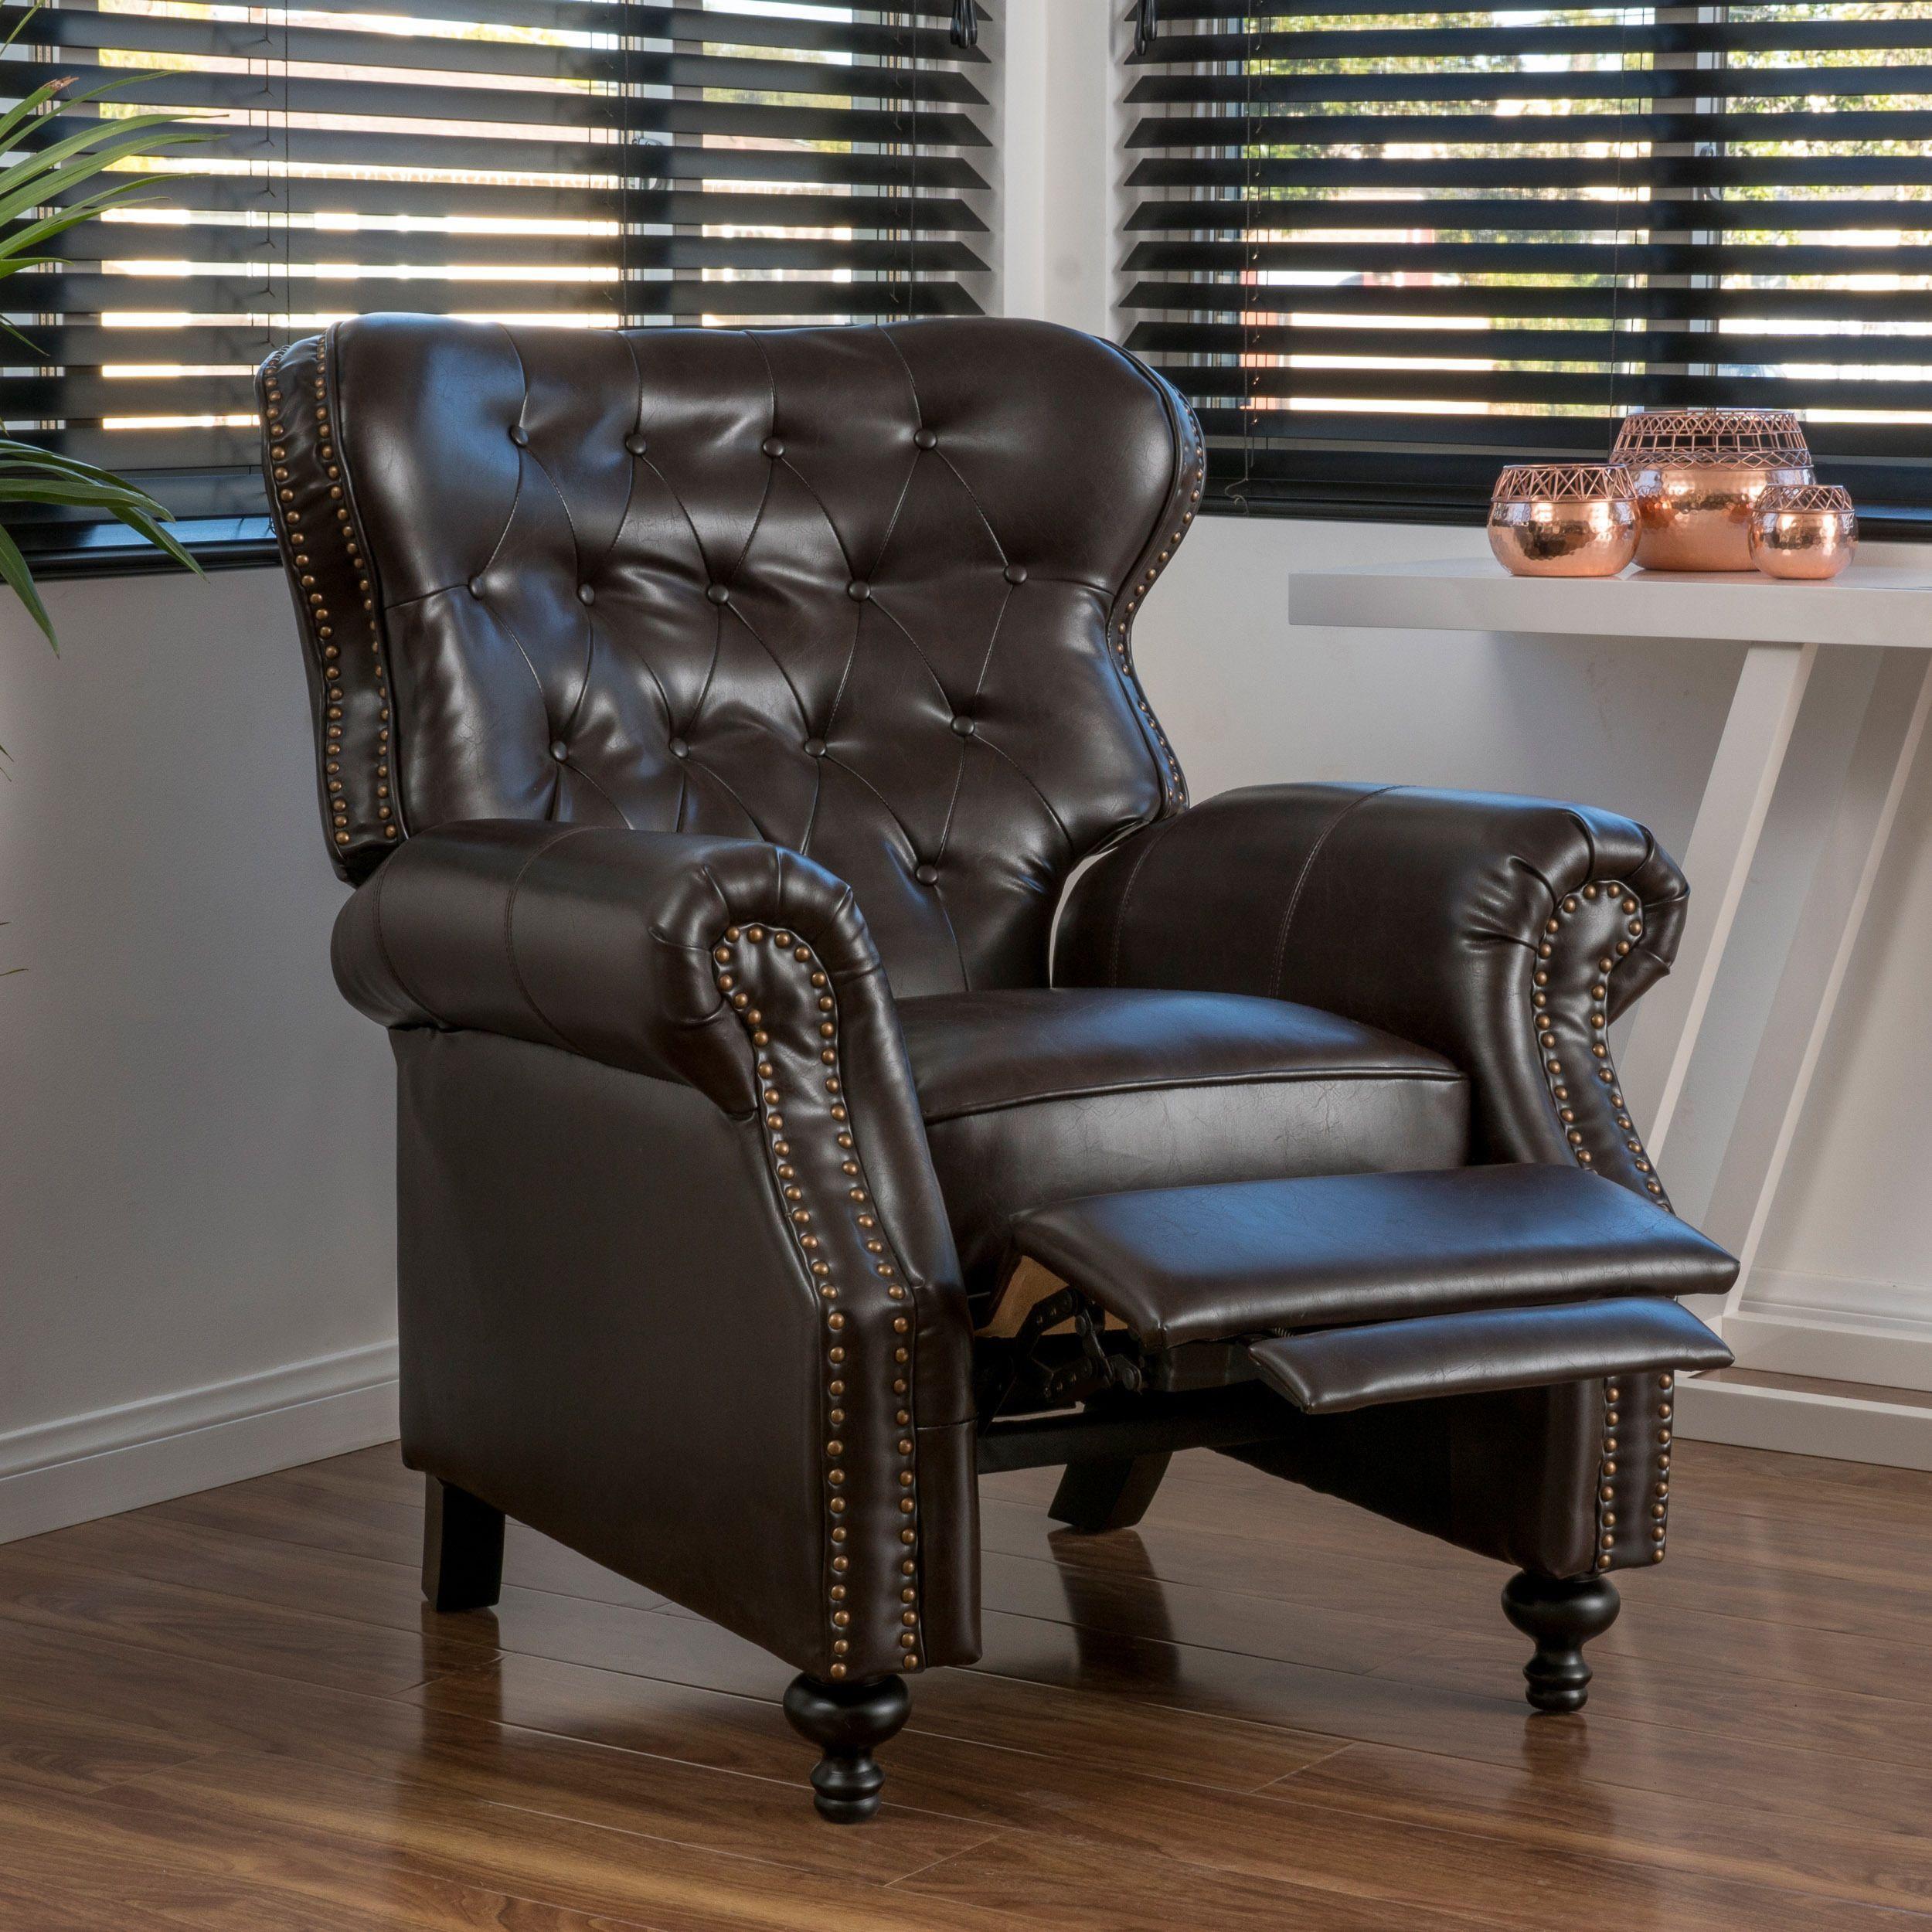 Corinne Stone Power Reclining Sofa $755 00 84W X 40D X 40H